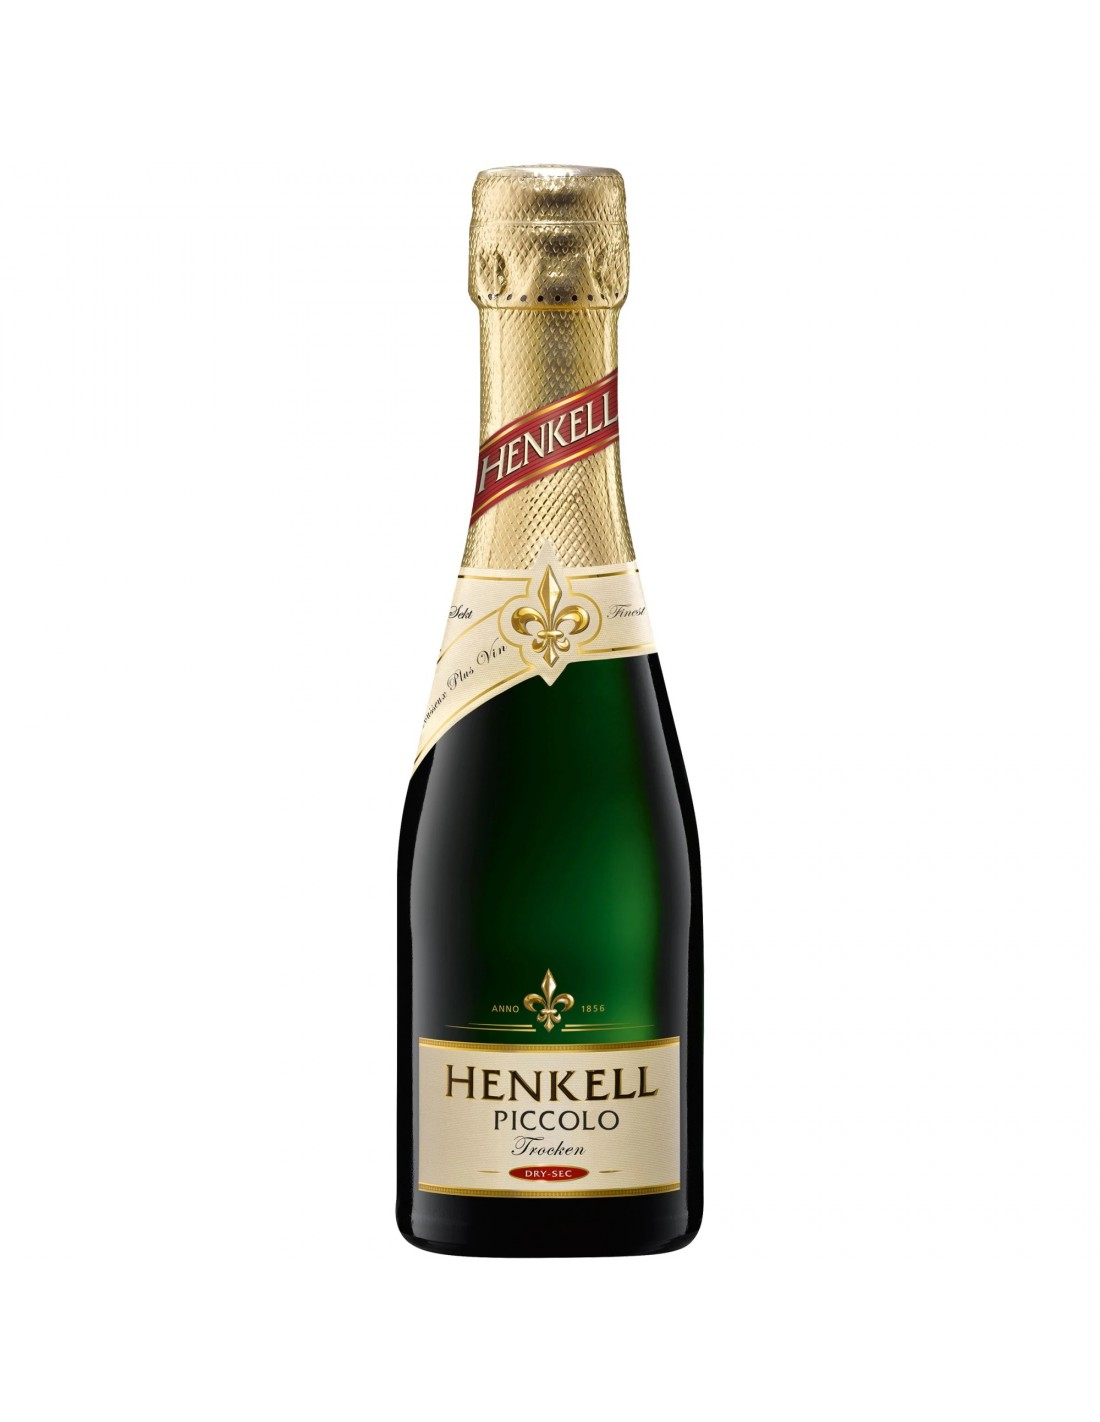 Vin spumant sec, Henkell Piccolo Trocken, 11.5% alc., 0.2L, Germania